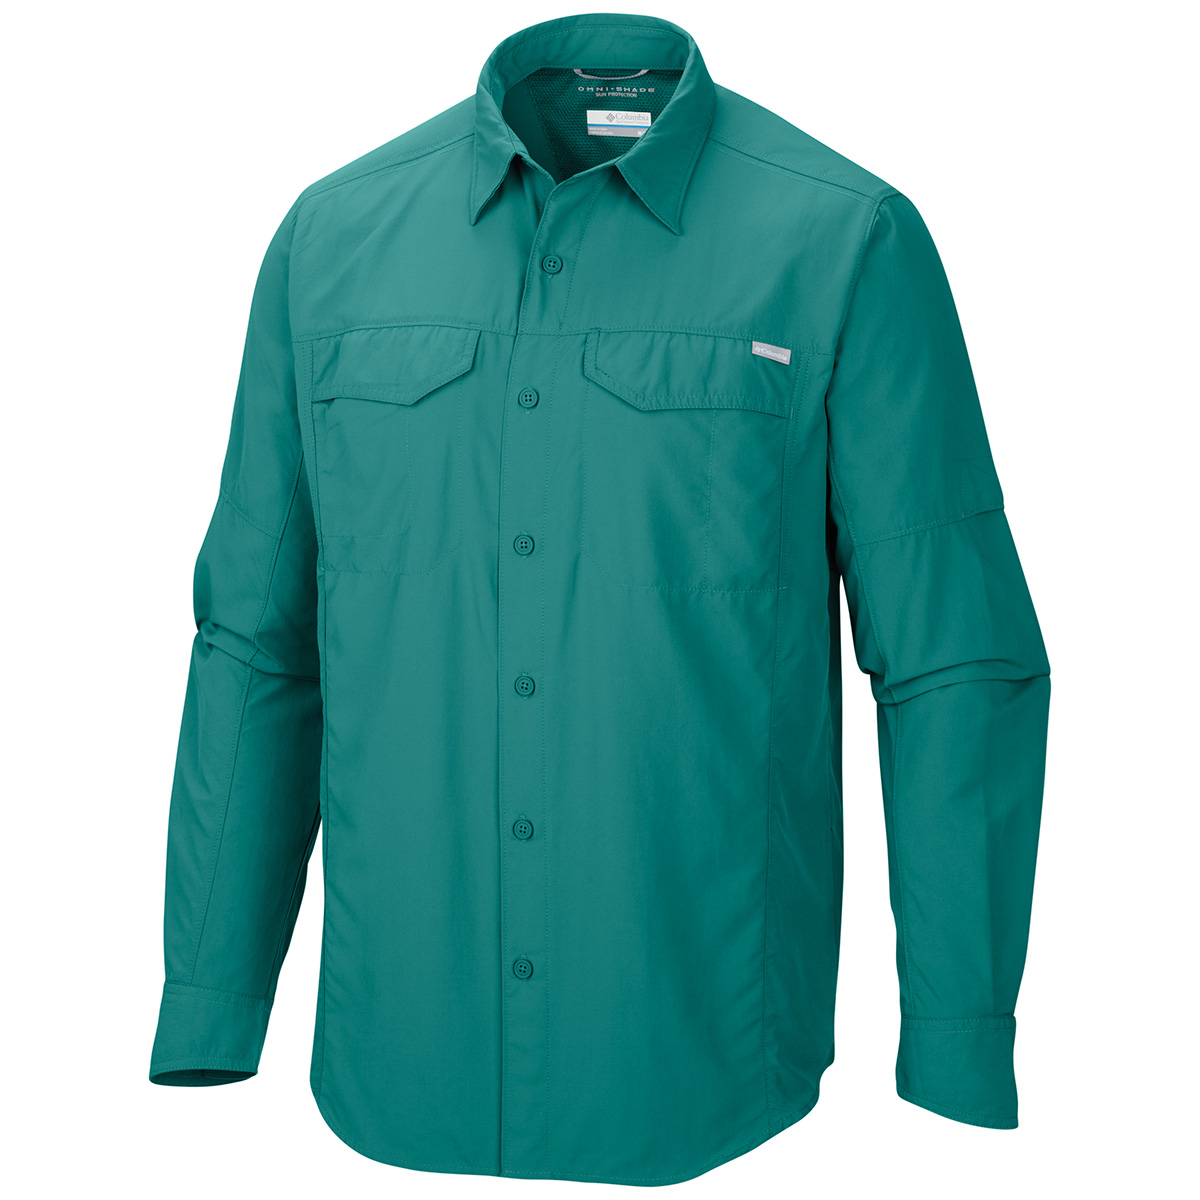 Columbia silver ridg long sleeve shirt fishing shirts for Fishing long sleeve shirts